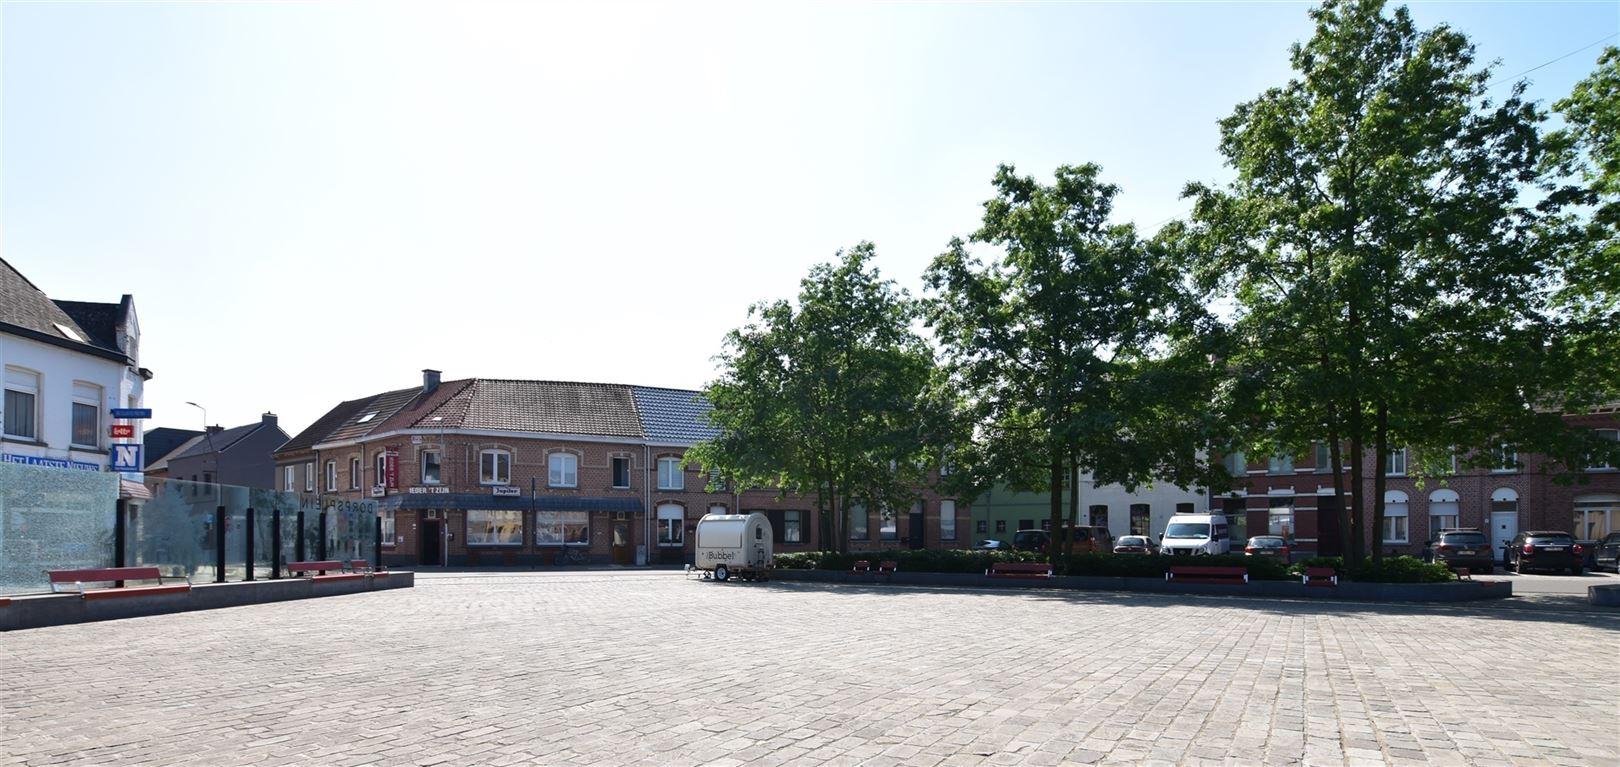 Foto 16 : Duplex/triplex te 9200 BAASRODE (België) - Prijs € 159.000